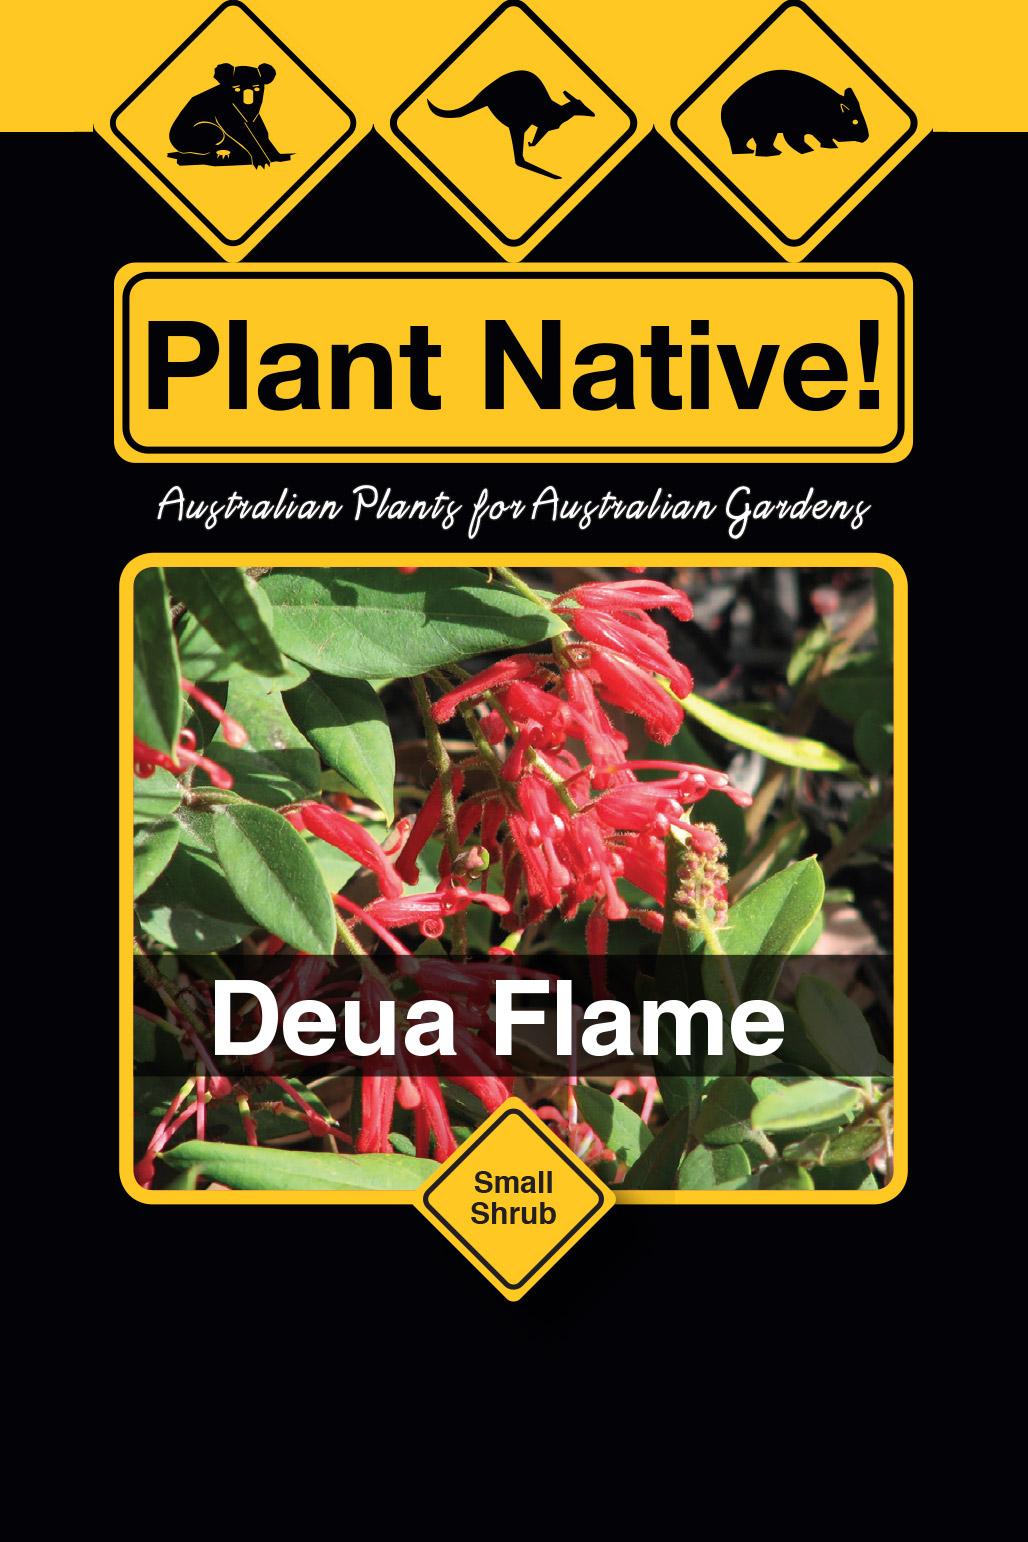 Deua Flame - Plant Native!